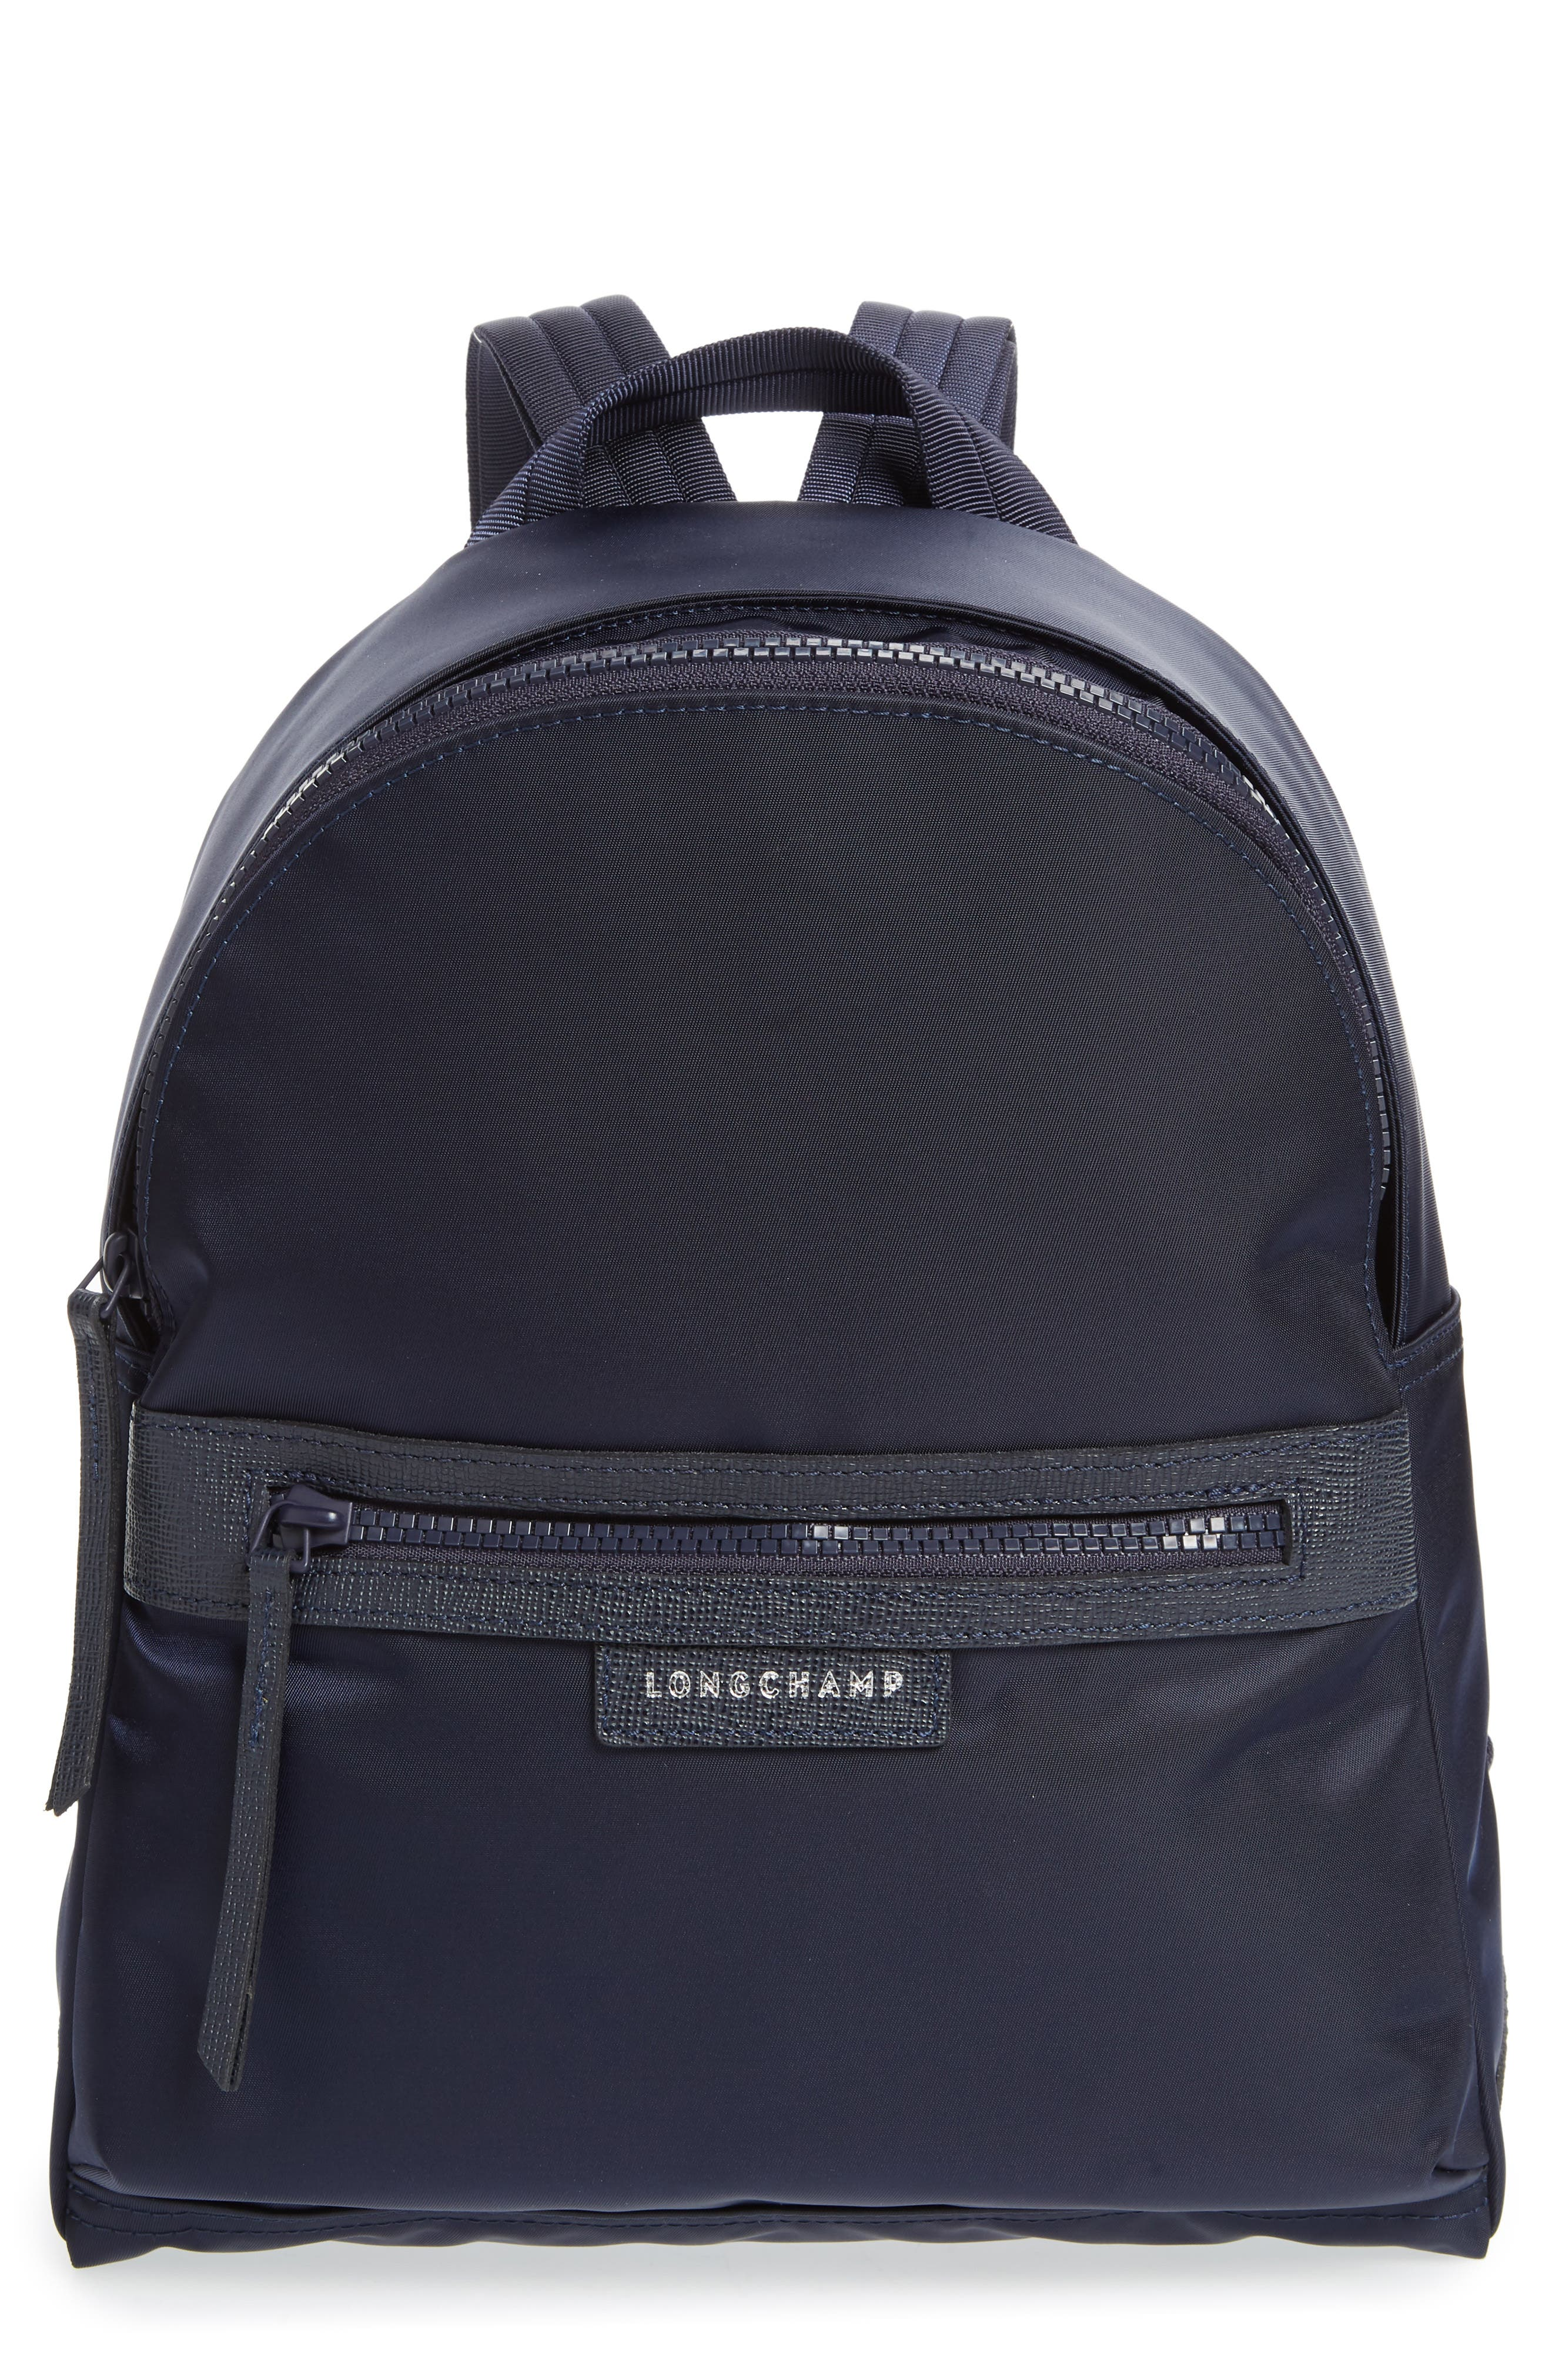 'Small Le Pliage Neo' Nylon Backpack,                             Main thumbnail 1, color,                             NAVY BLUE